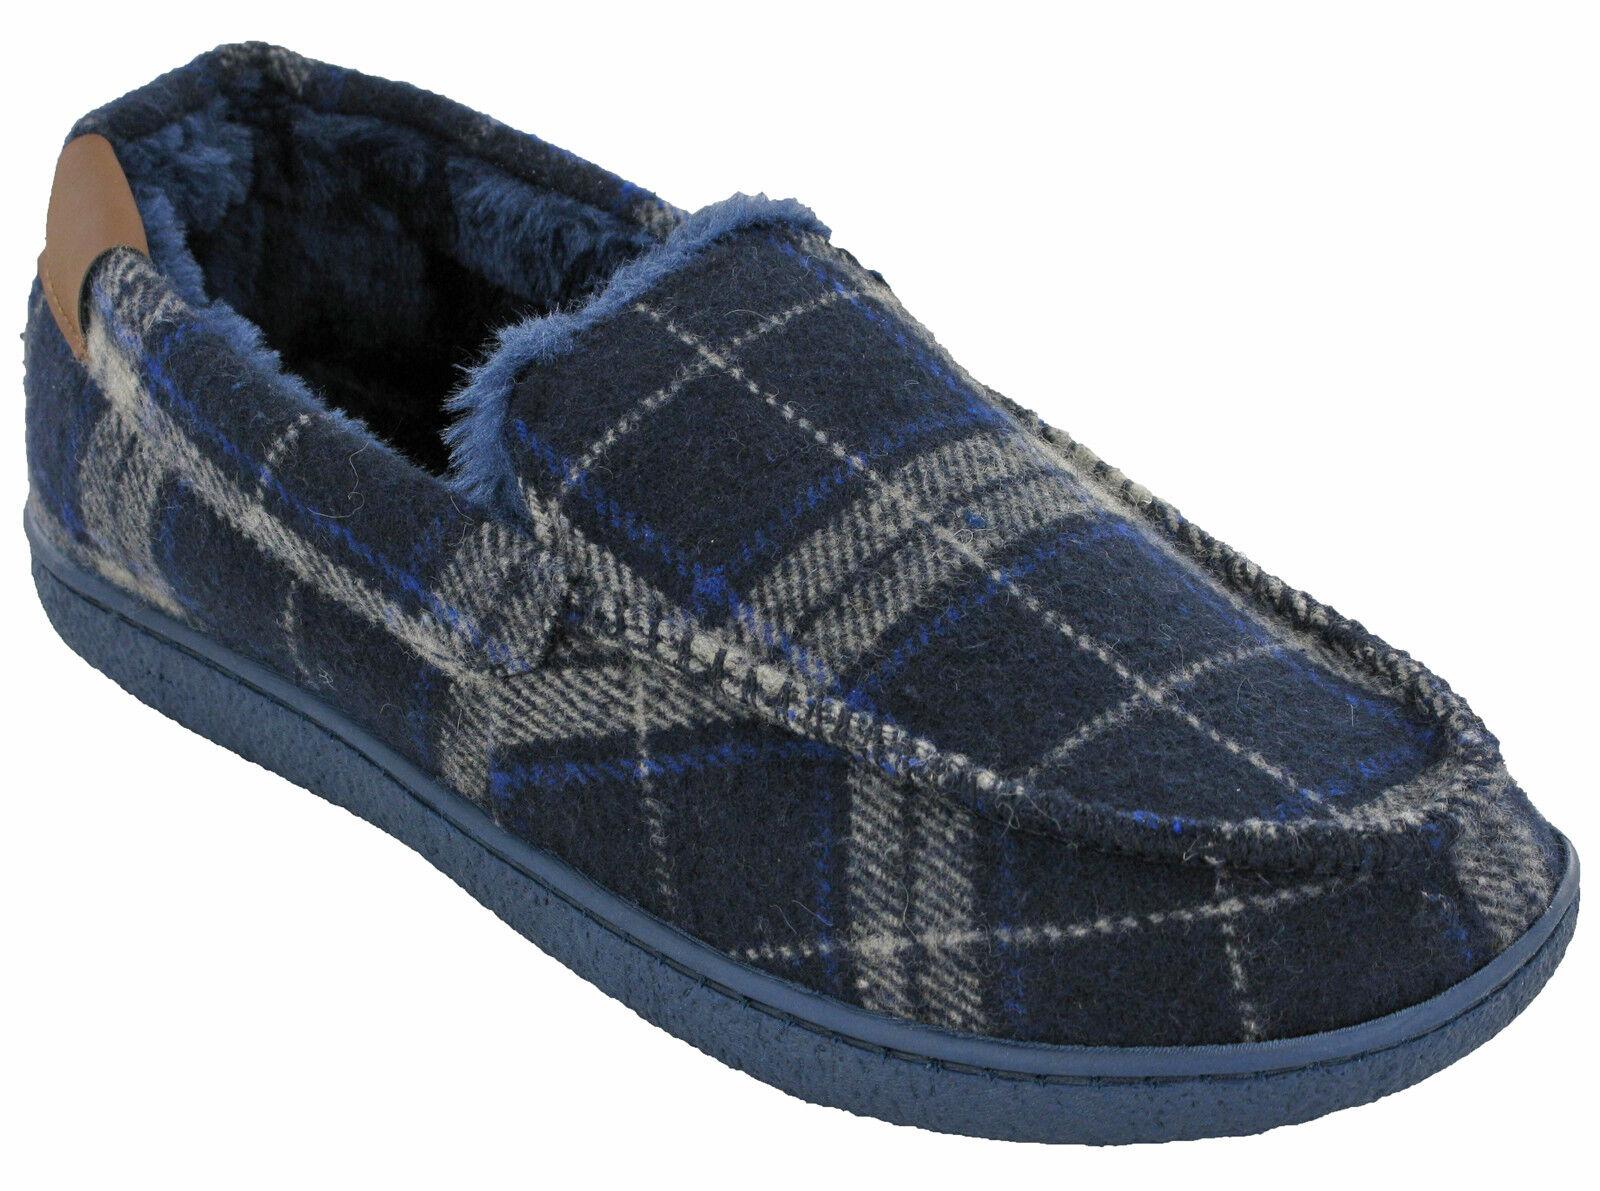 Cuscino a piedi Mens pantofole mocassino caldo Check interno foderato Tweed  inverno coperta all aperto bde5c18458e